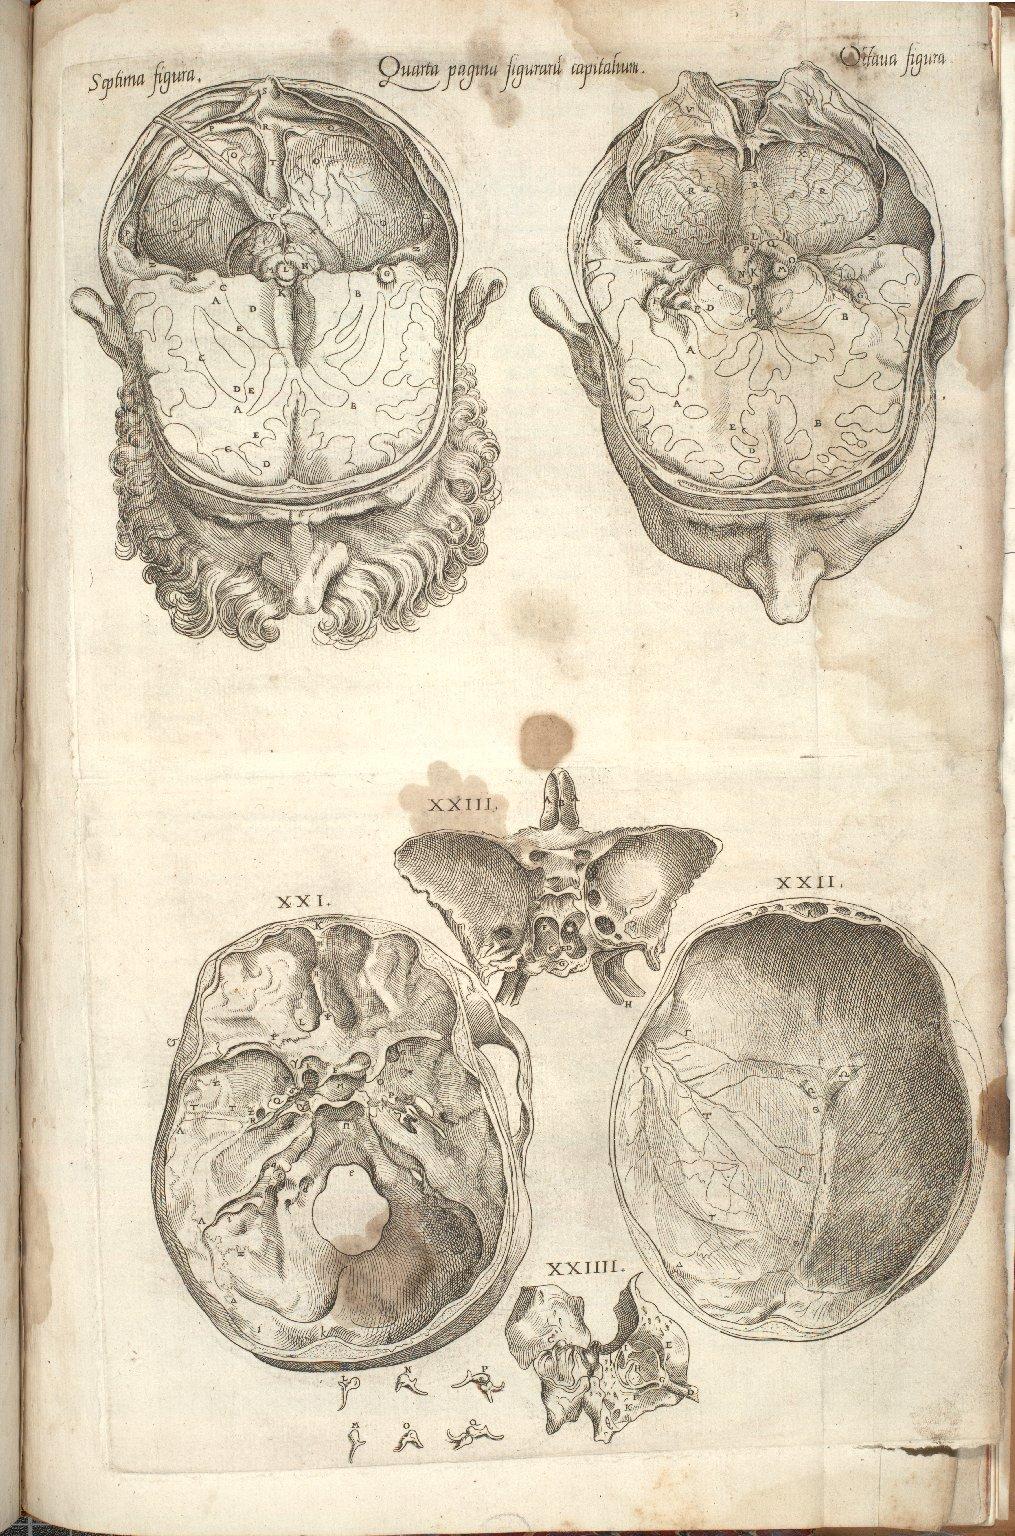 Quarta Pagina Figuraru Capitalium